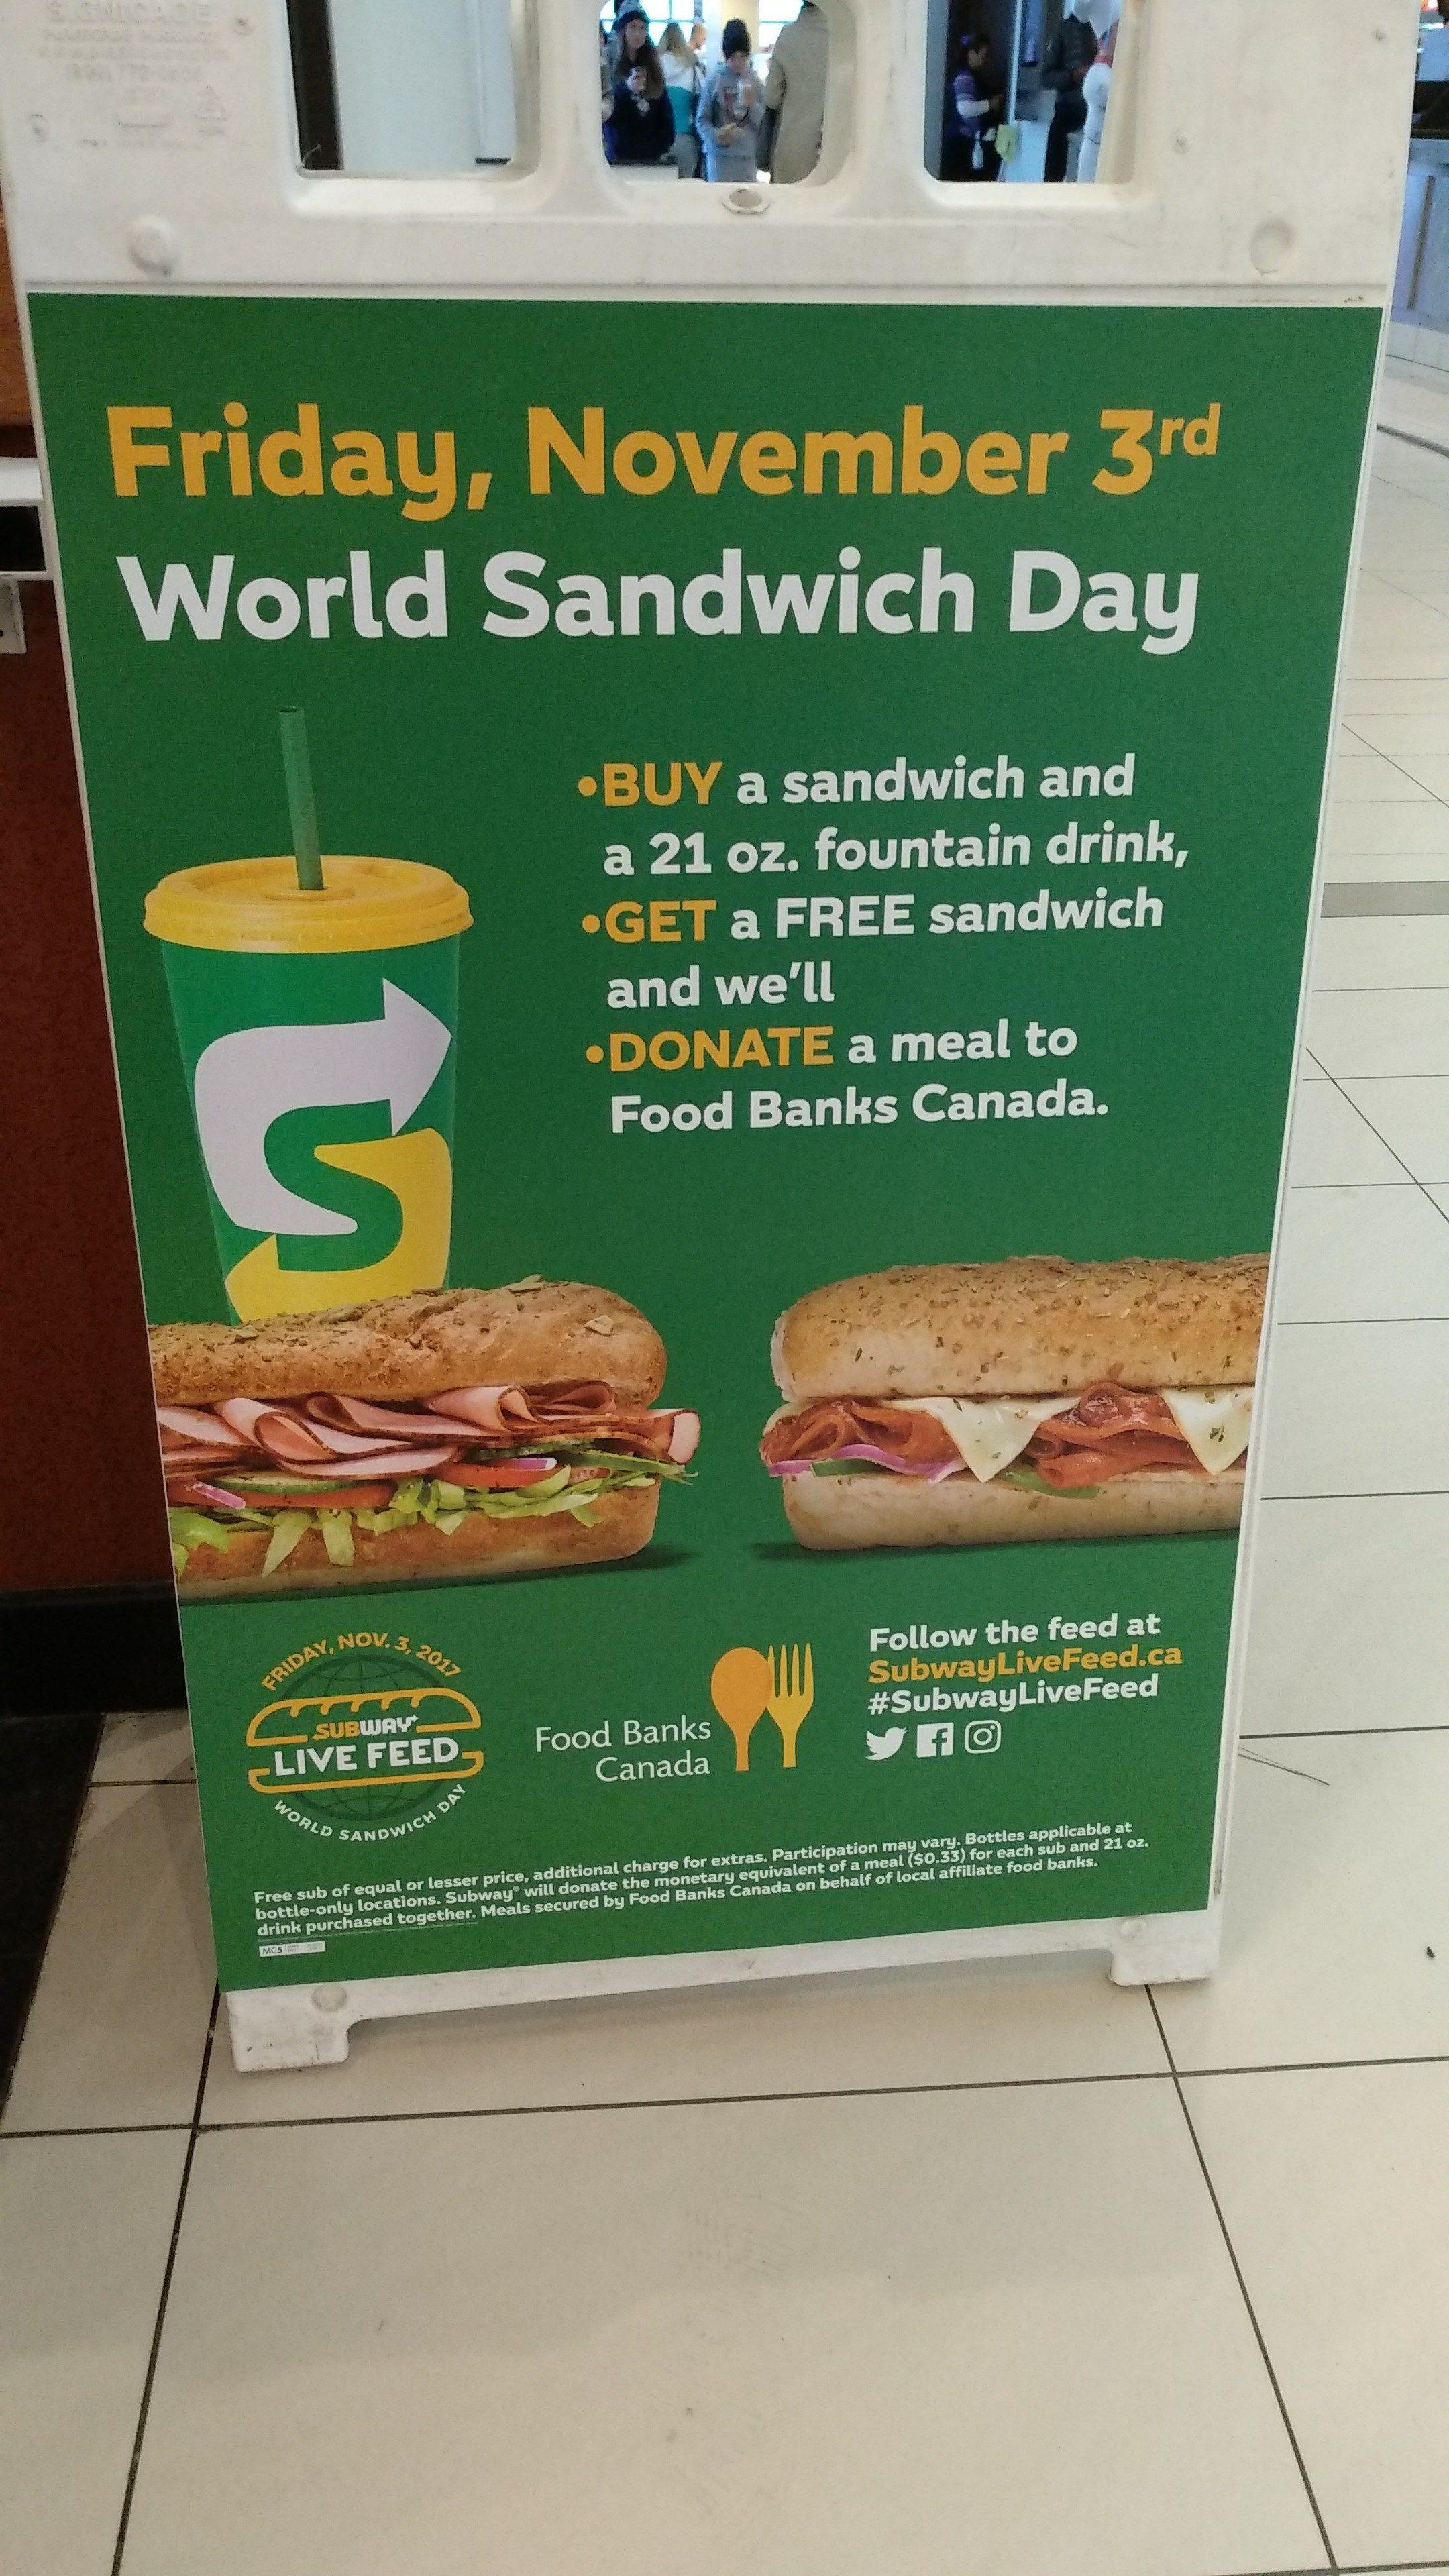 Subway 30 oz drink cost